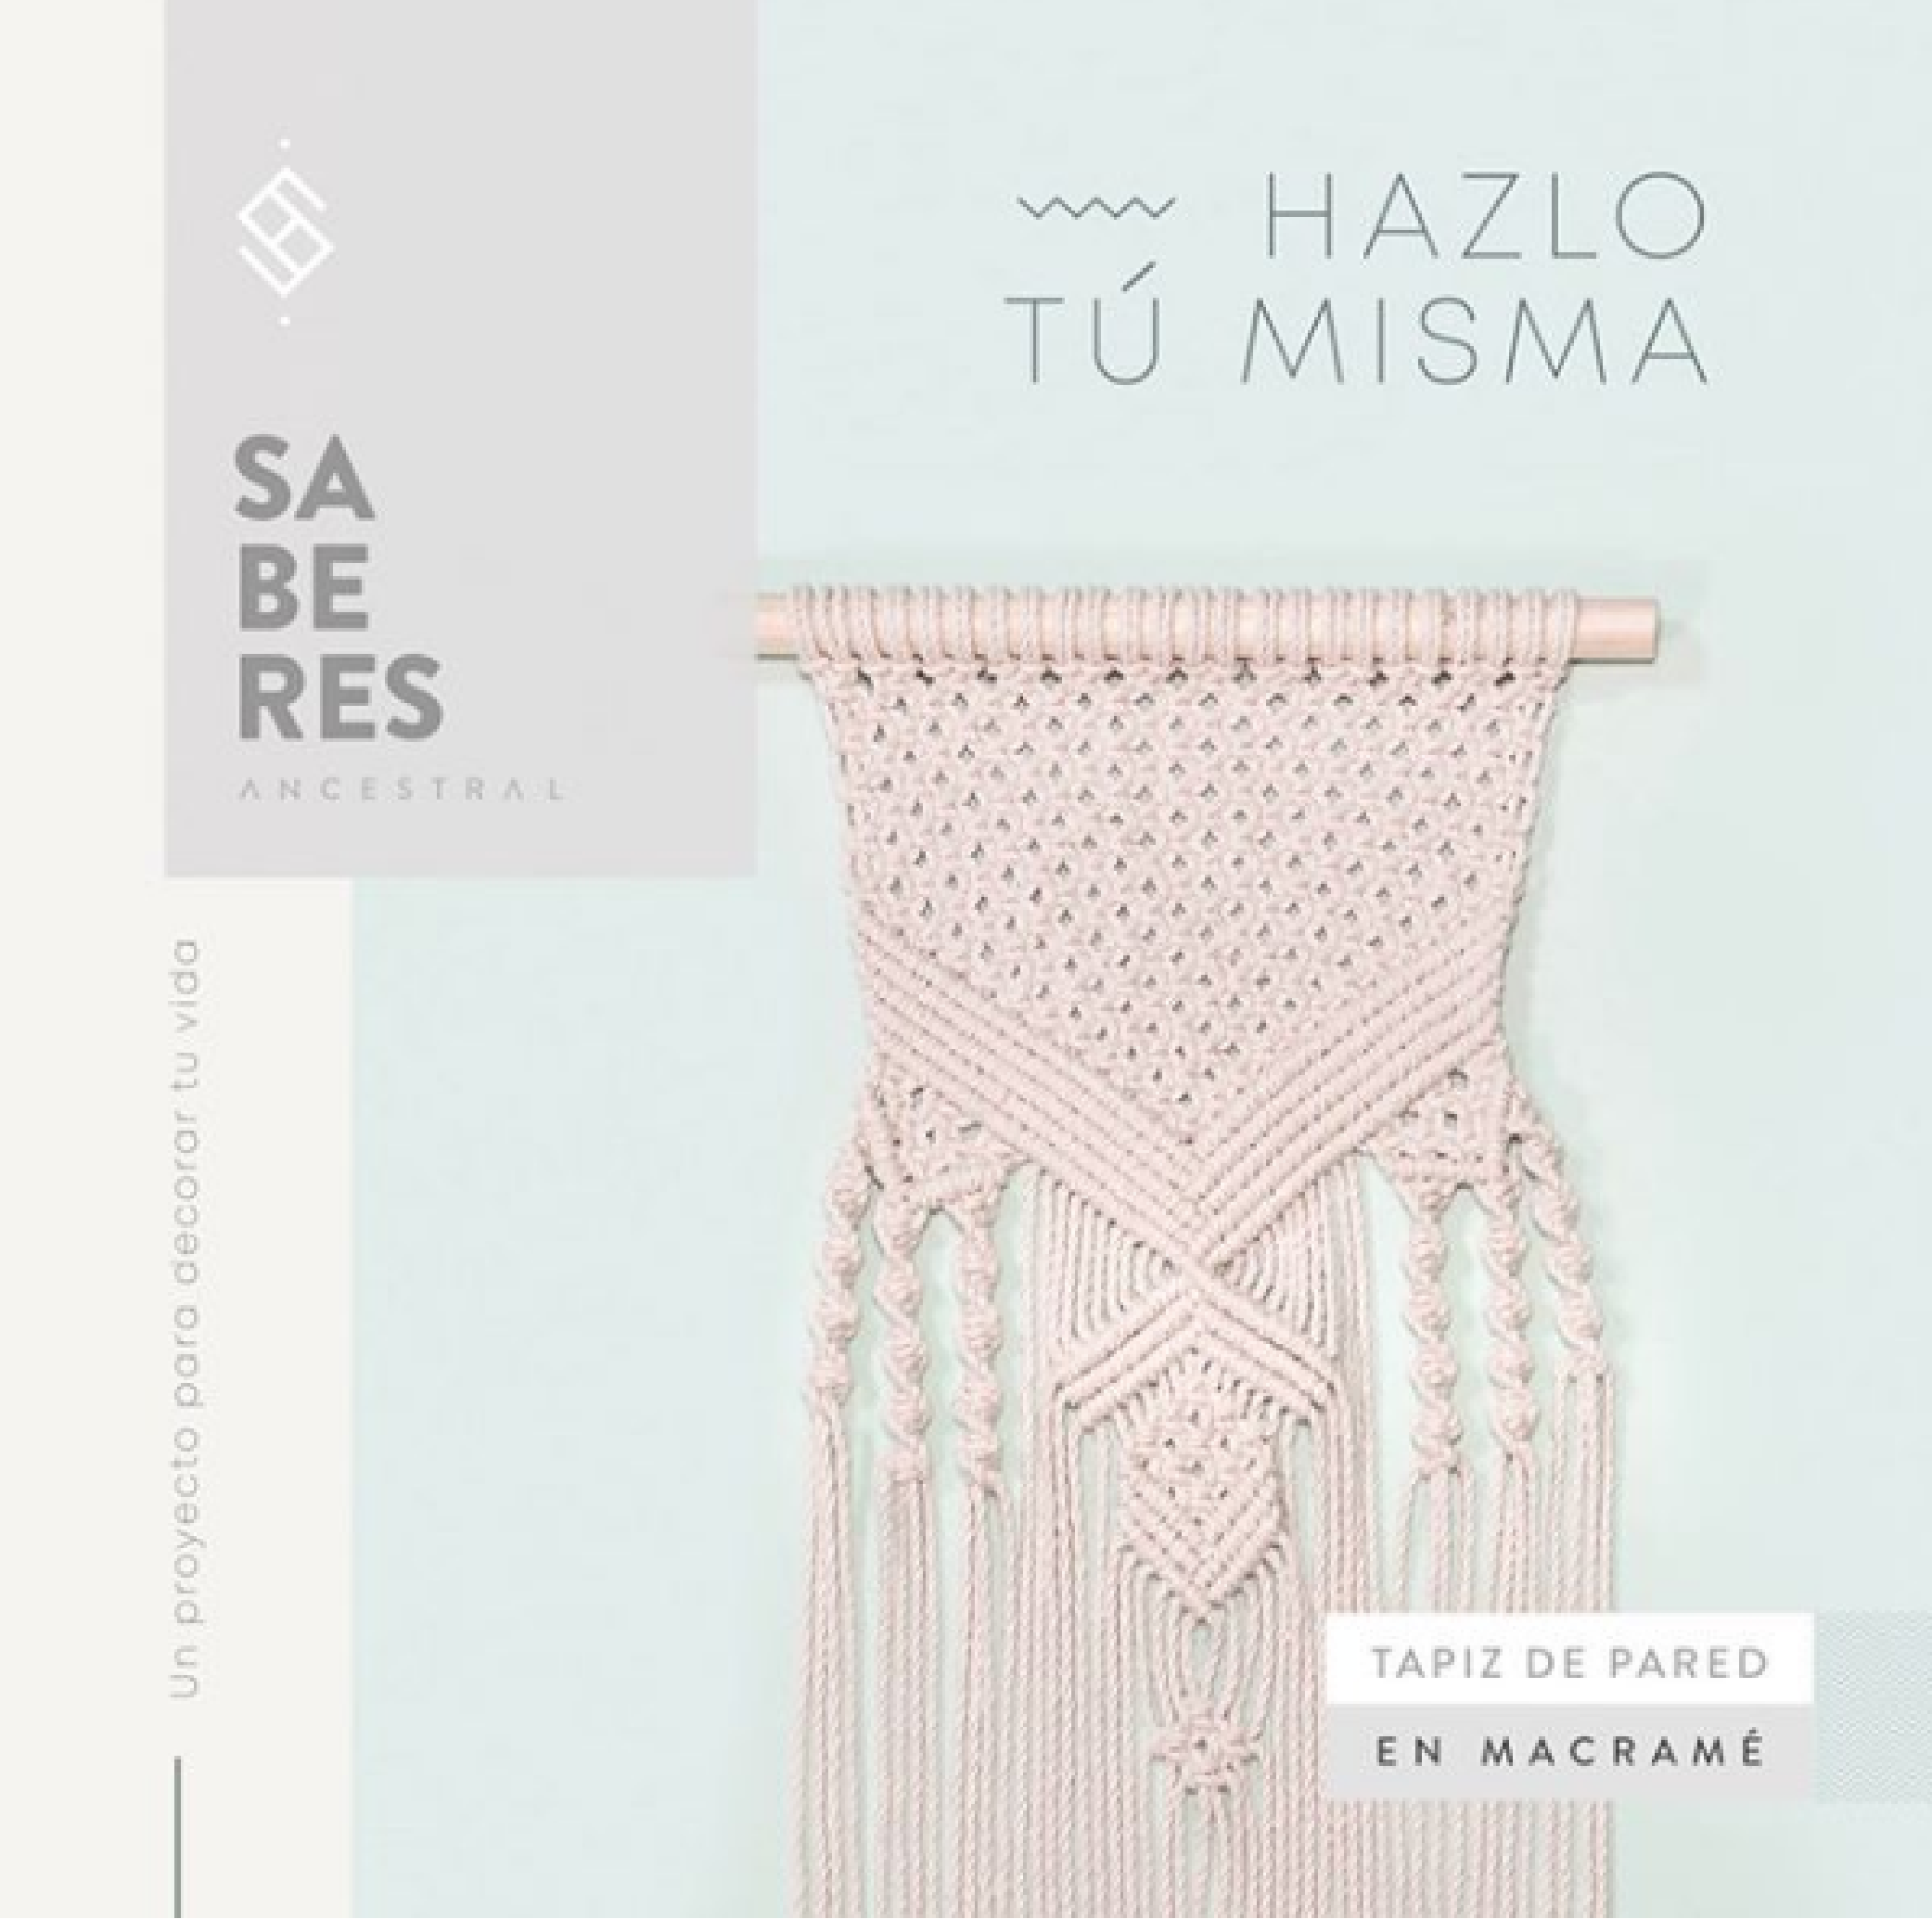 Kit Tapiz De Pared Hazlo Tu Mismo _2